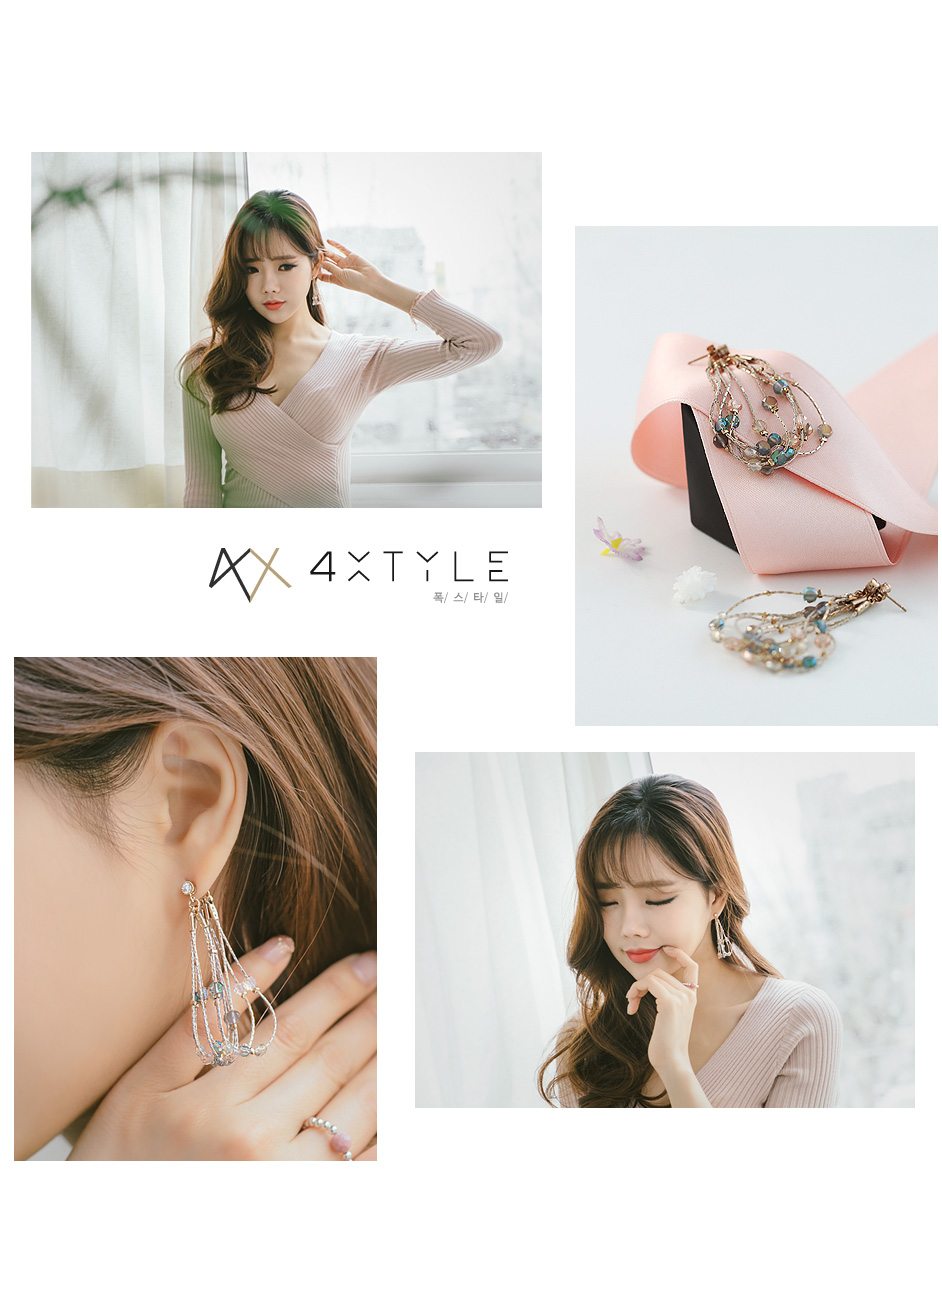 [ 4xtyle ] [手工制作]名叫萨布里娜的耳环